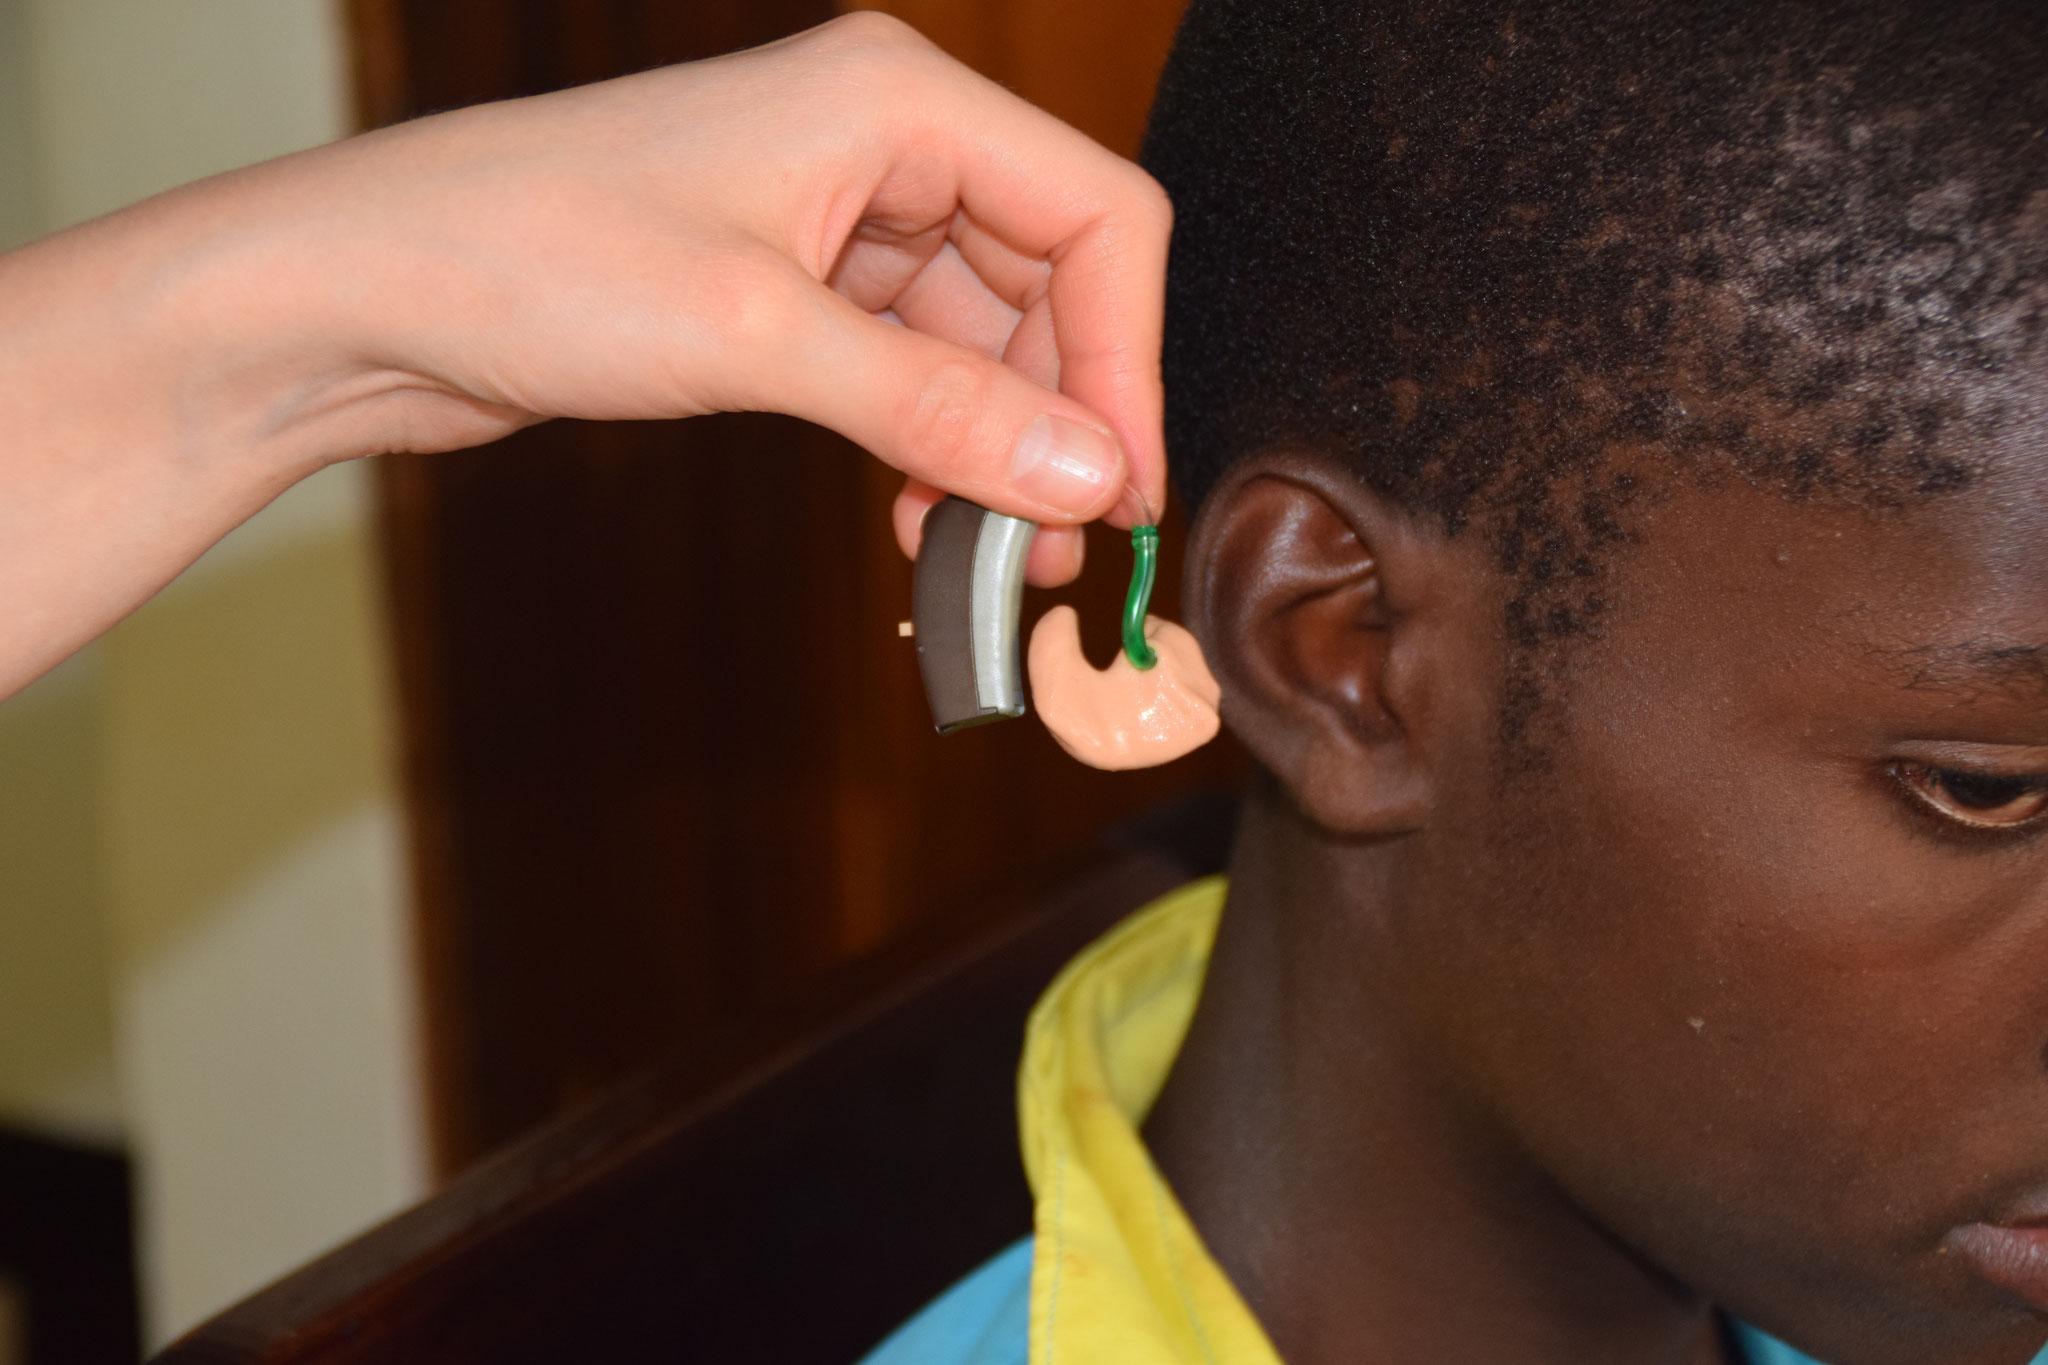 Hörgerät ist fertig für den Gebrauch.